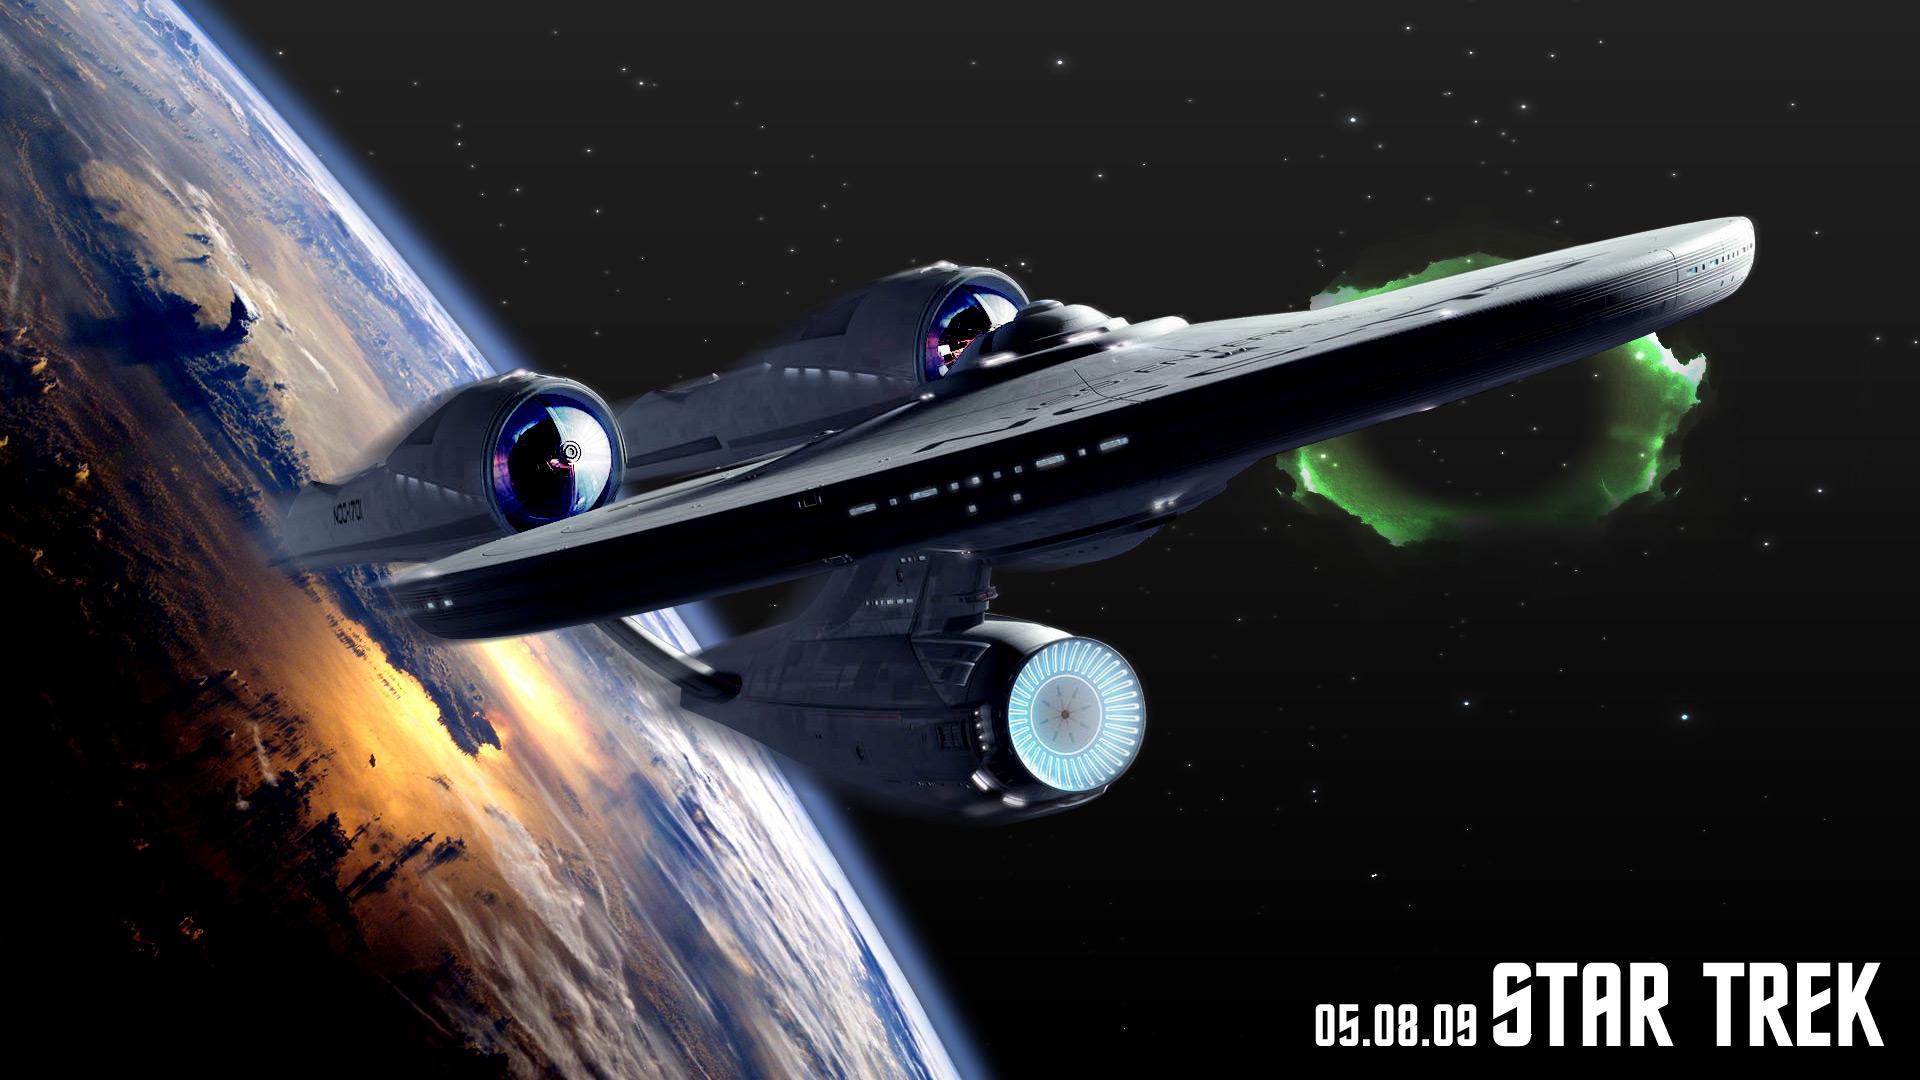 Star Trek Wallpaper HD 1920x1080 ImageBankbiz 1920x1080